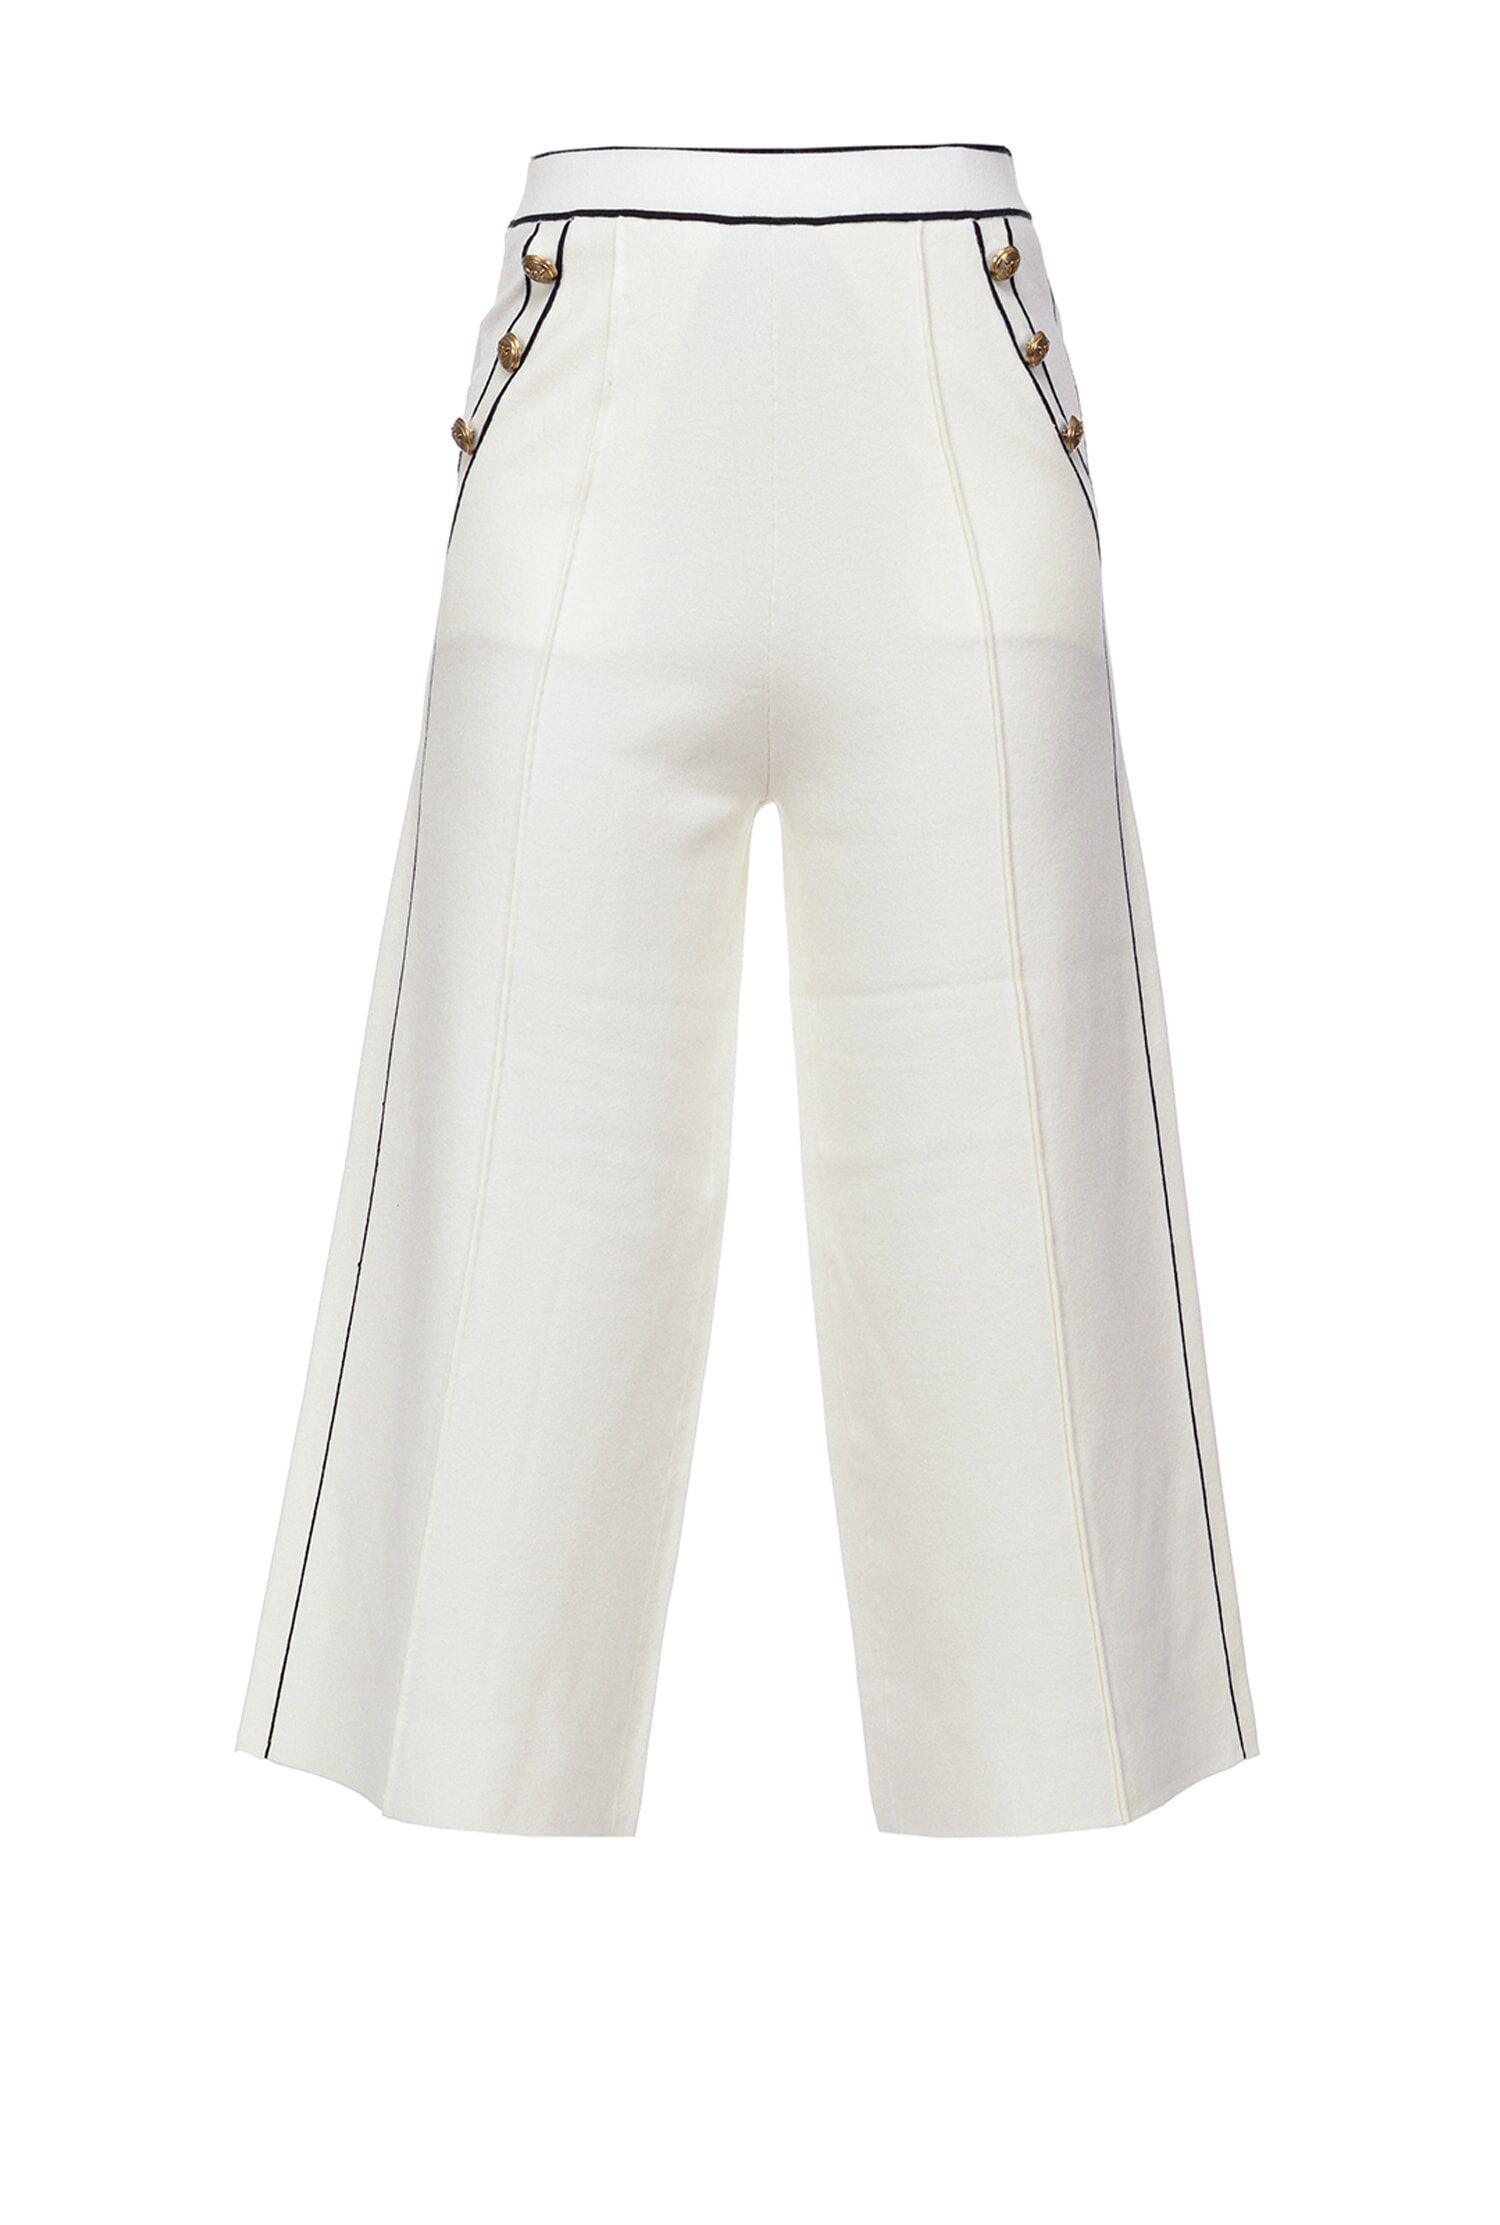 Pantaloni Culotte Marinière - Pinko